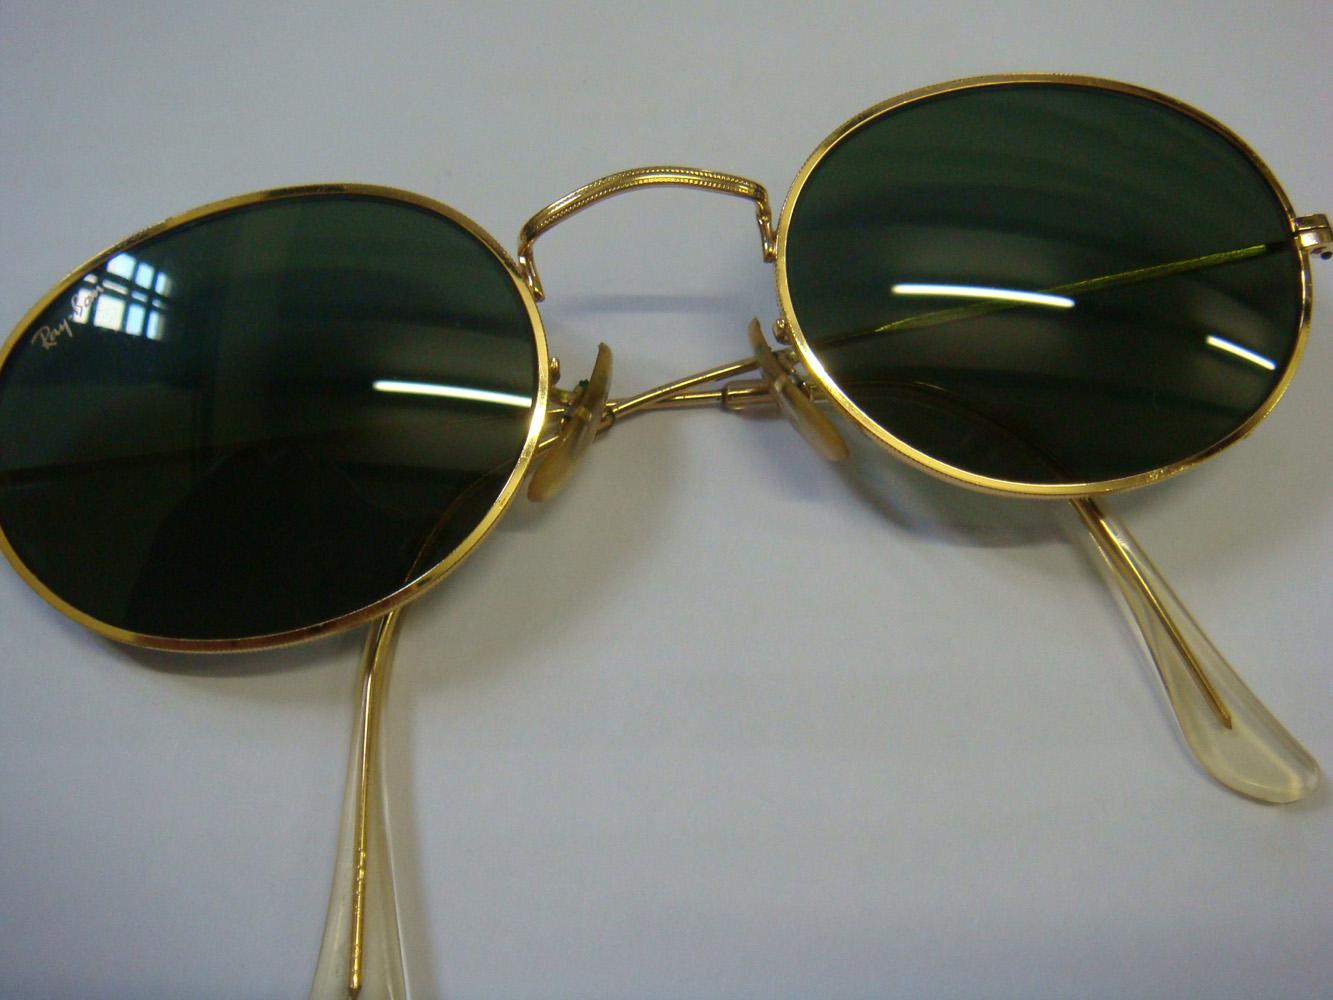 ff082c89c6 Ray Ban John Lennon Sunglasses « Heritage Malta